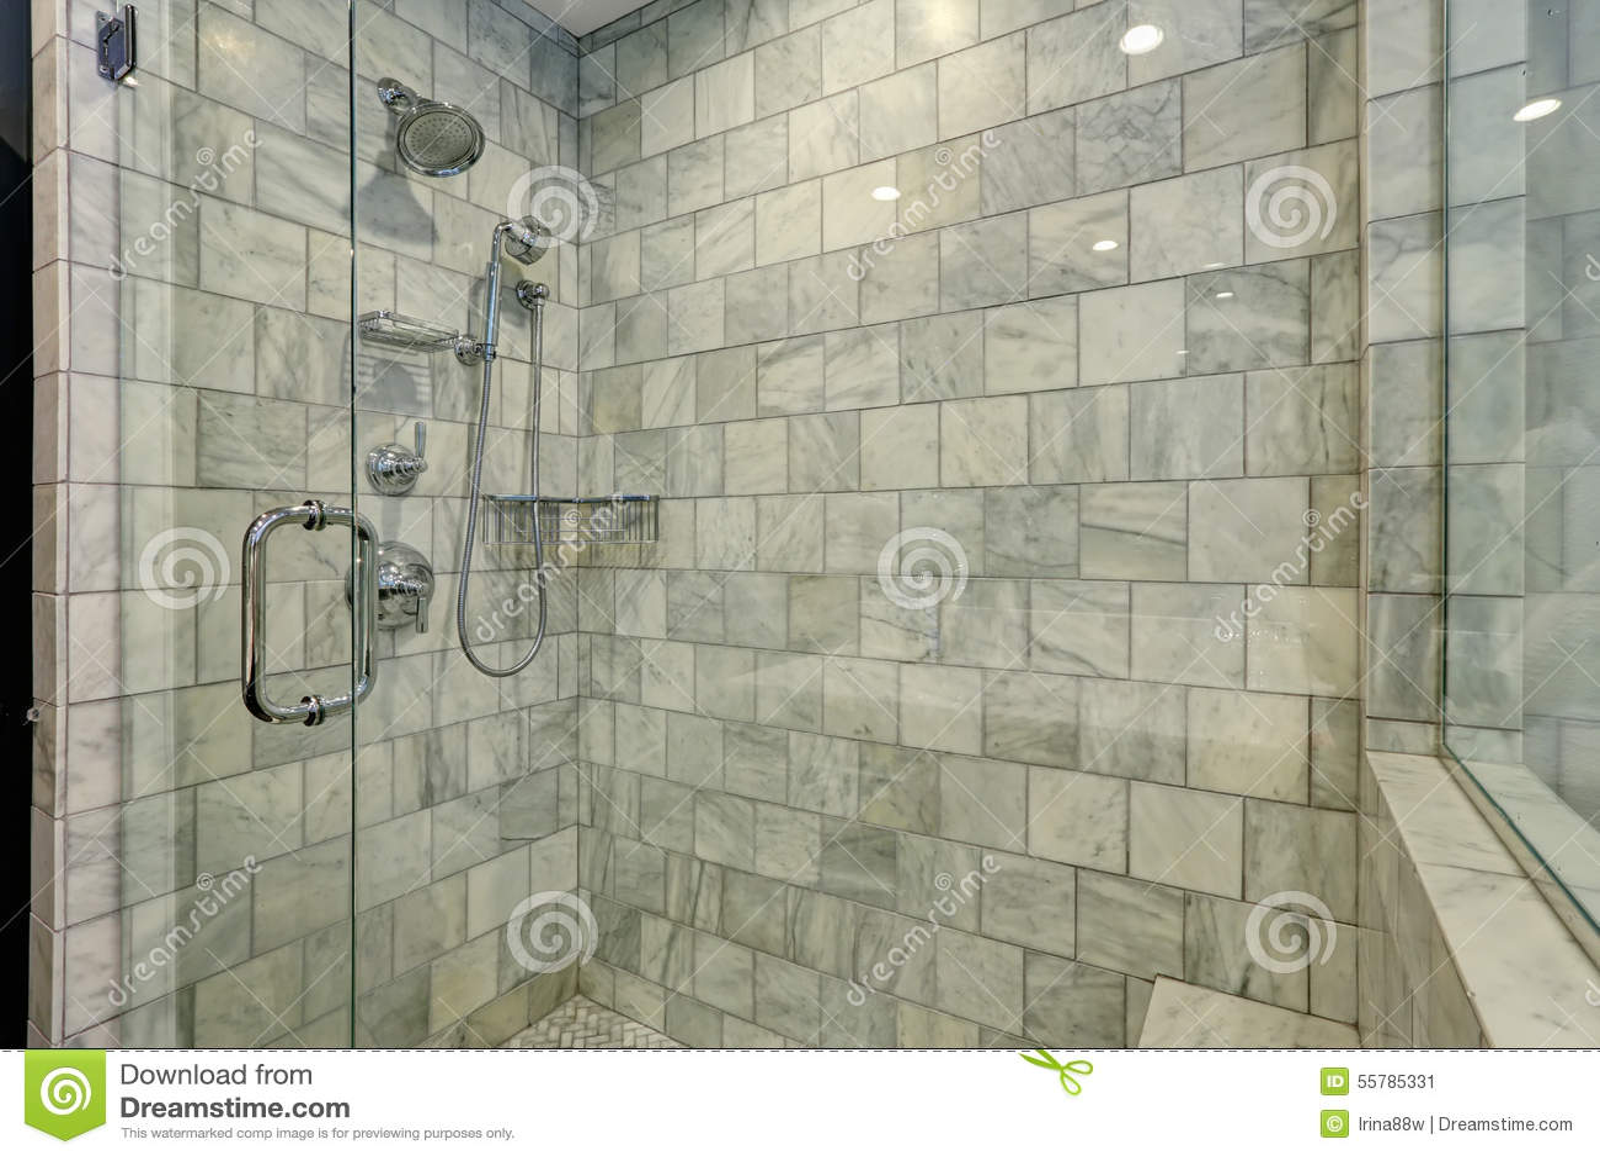 salle de bain marocaine moderne salle de bain de luxe en marbre lombards - Salle De Bain Marocaine Moderne